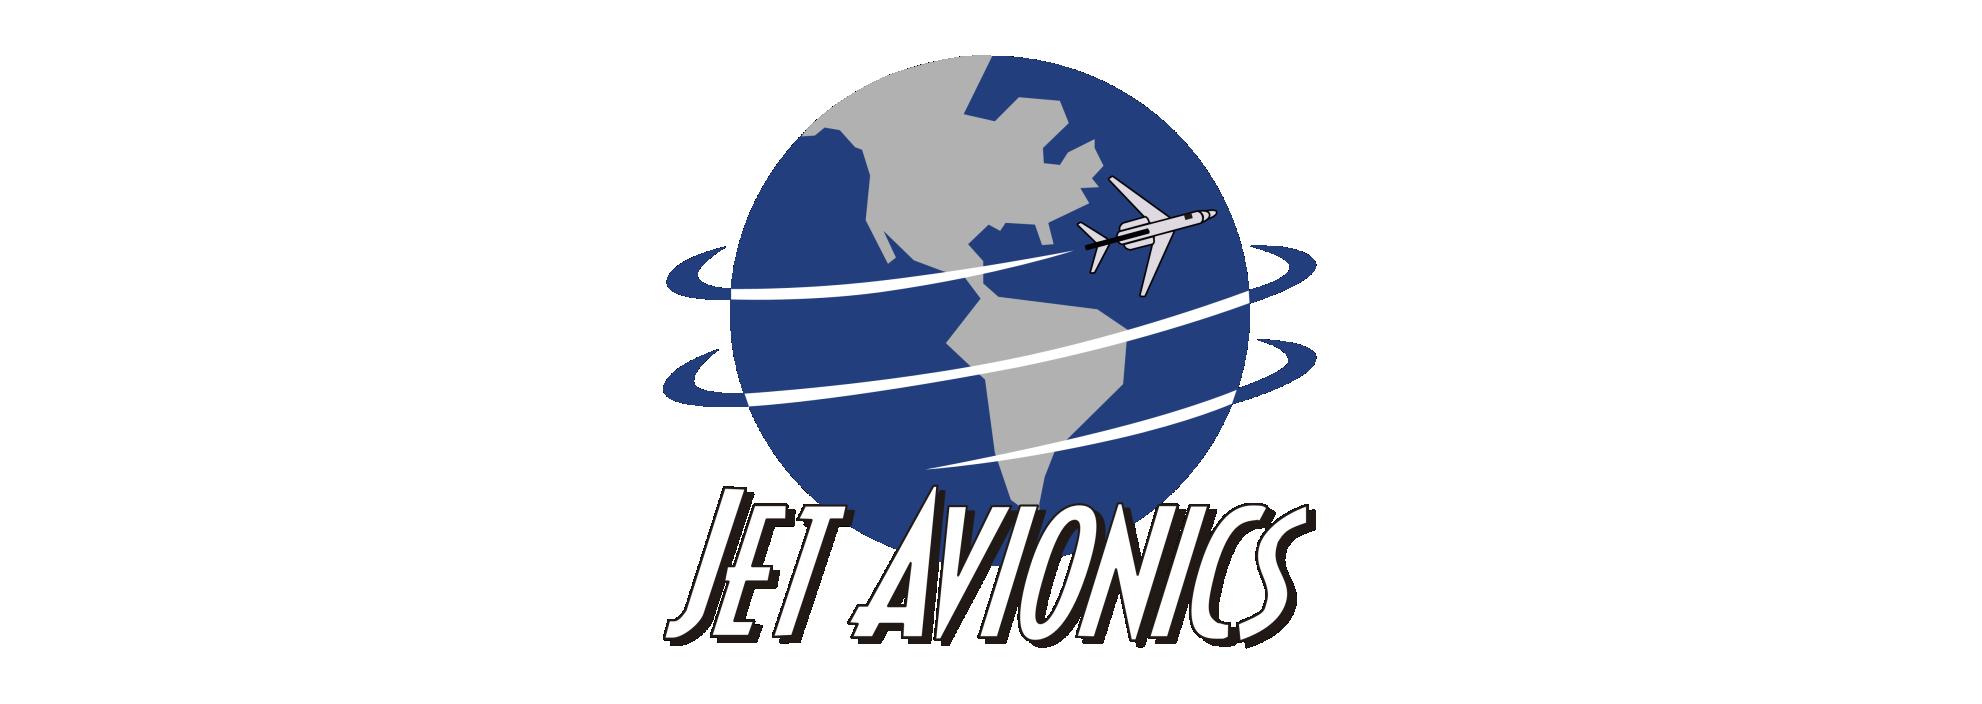 https://www.abraphe.org.br/wp-content/uploads/2019/04/logo_jet_avionics.png